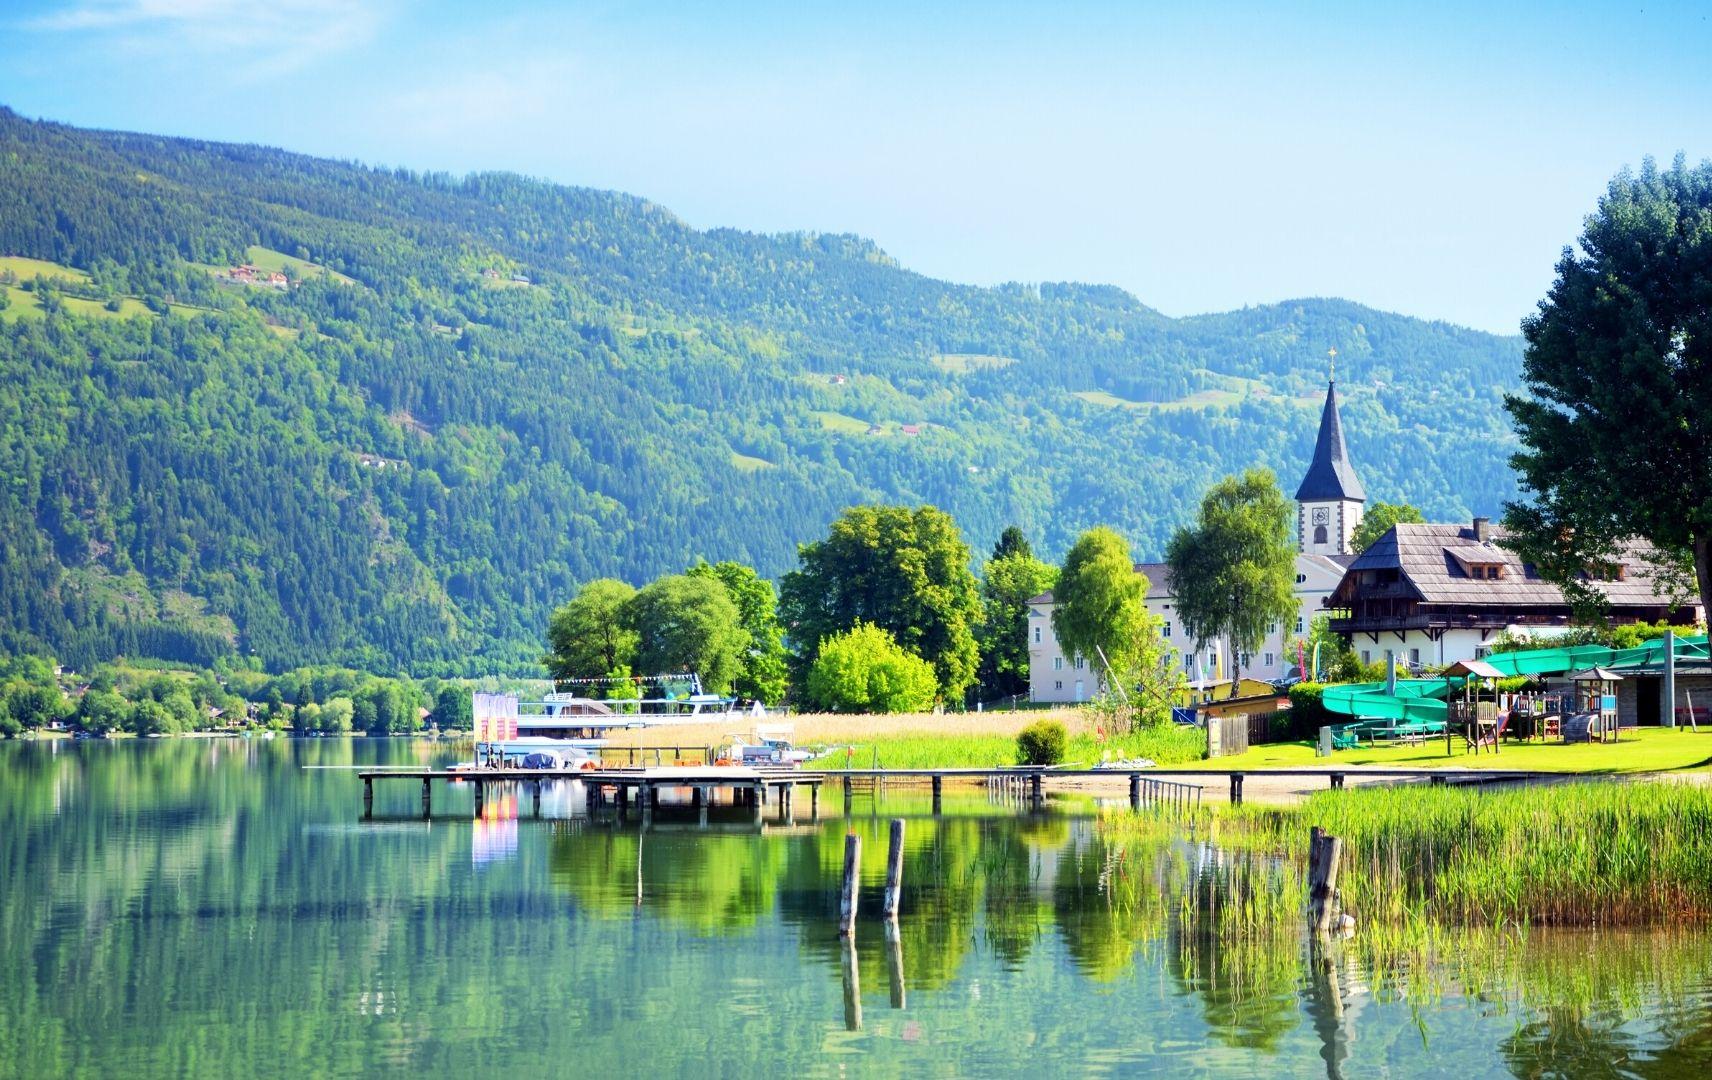 Dorf am See Landschaft